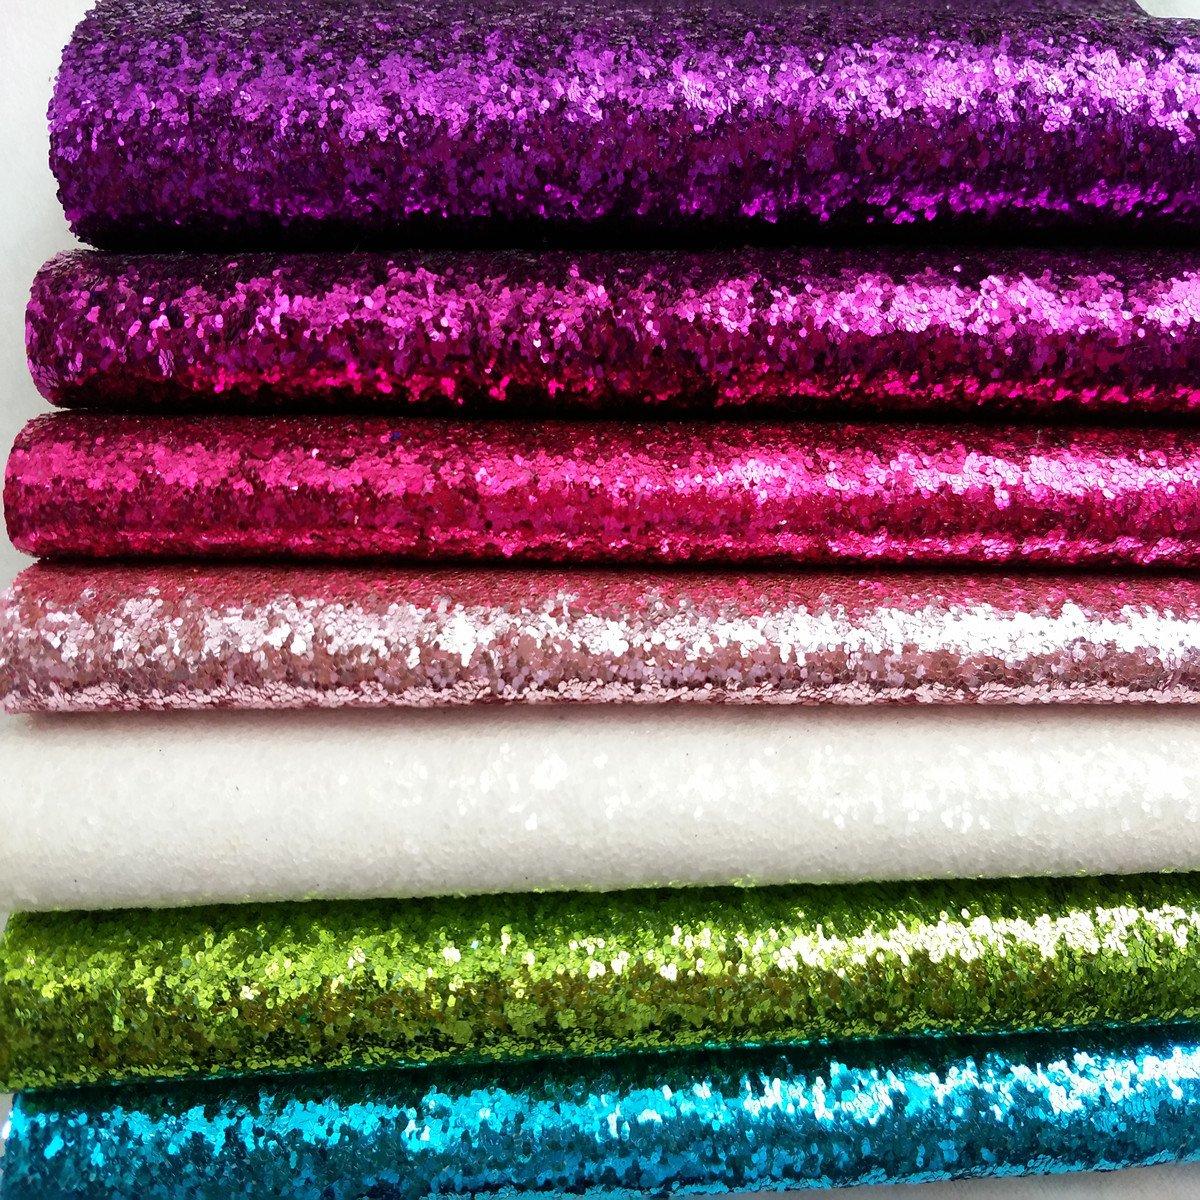 ZAIONE 8 pcs A4 (8 x 12) Sheets ColorfulPastel Fine Glitter Vinyl Fabric Sparkle Leather Material Crafts Bow Decor Plain for Shoes Bag Sewing Patchwork DIY Craft Applique (Fine Glitter-Pastel)